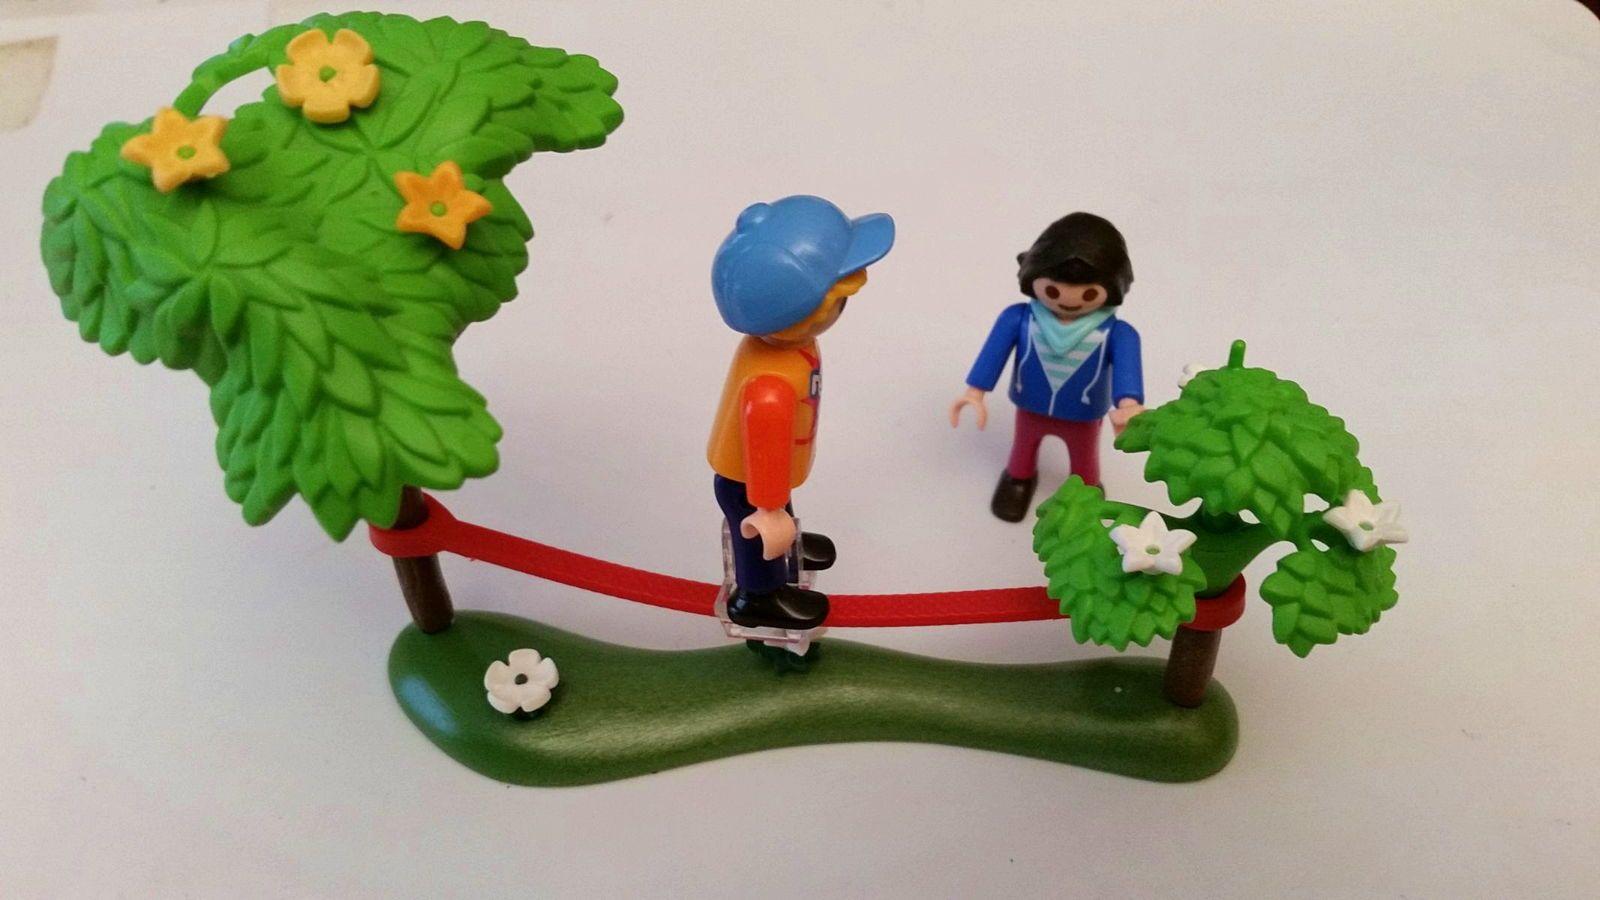 Playmobil slackline